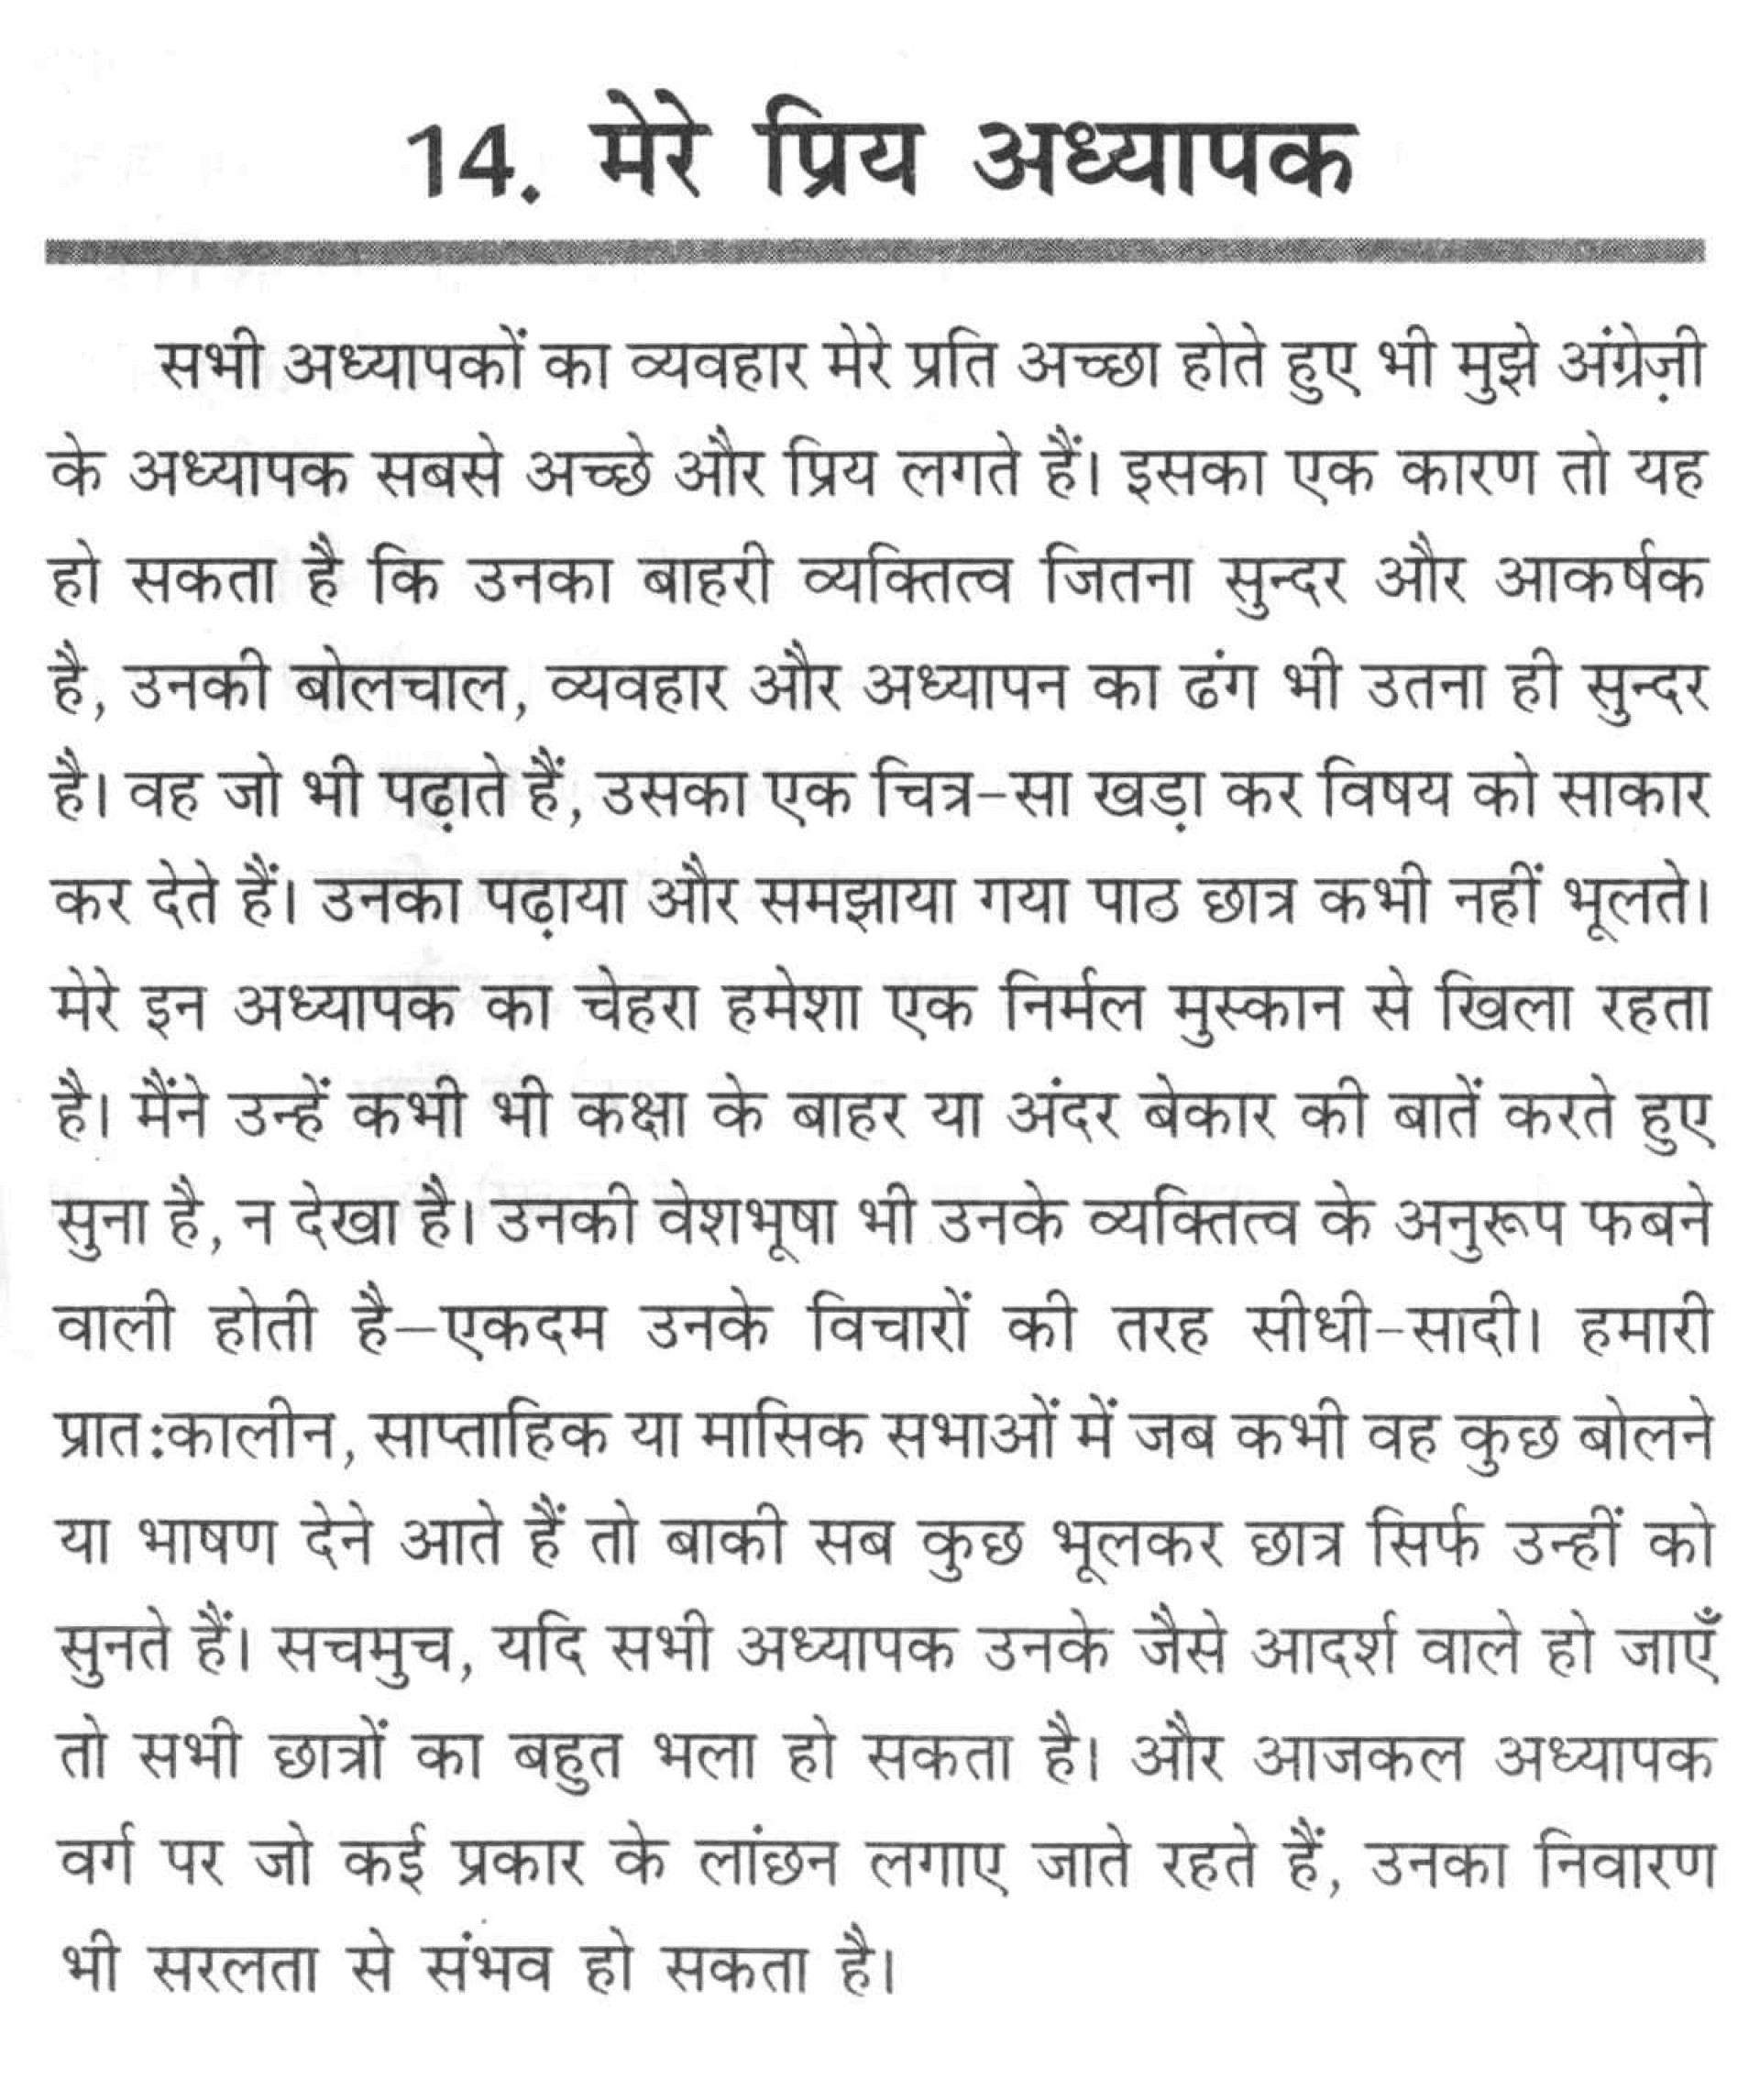 020 Essay On Teacher Example Marvelous Teachers In Kannada Profession Urdu Day Hindi For Class 2 1920